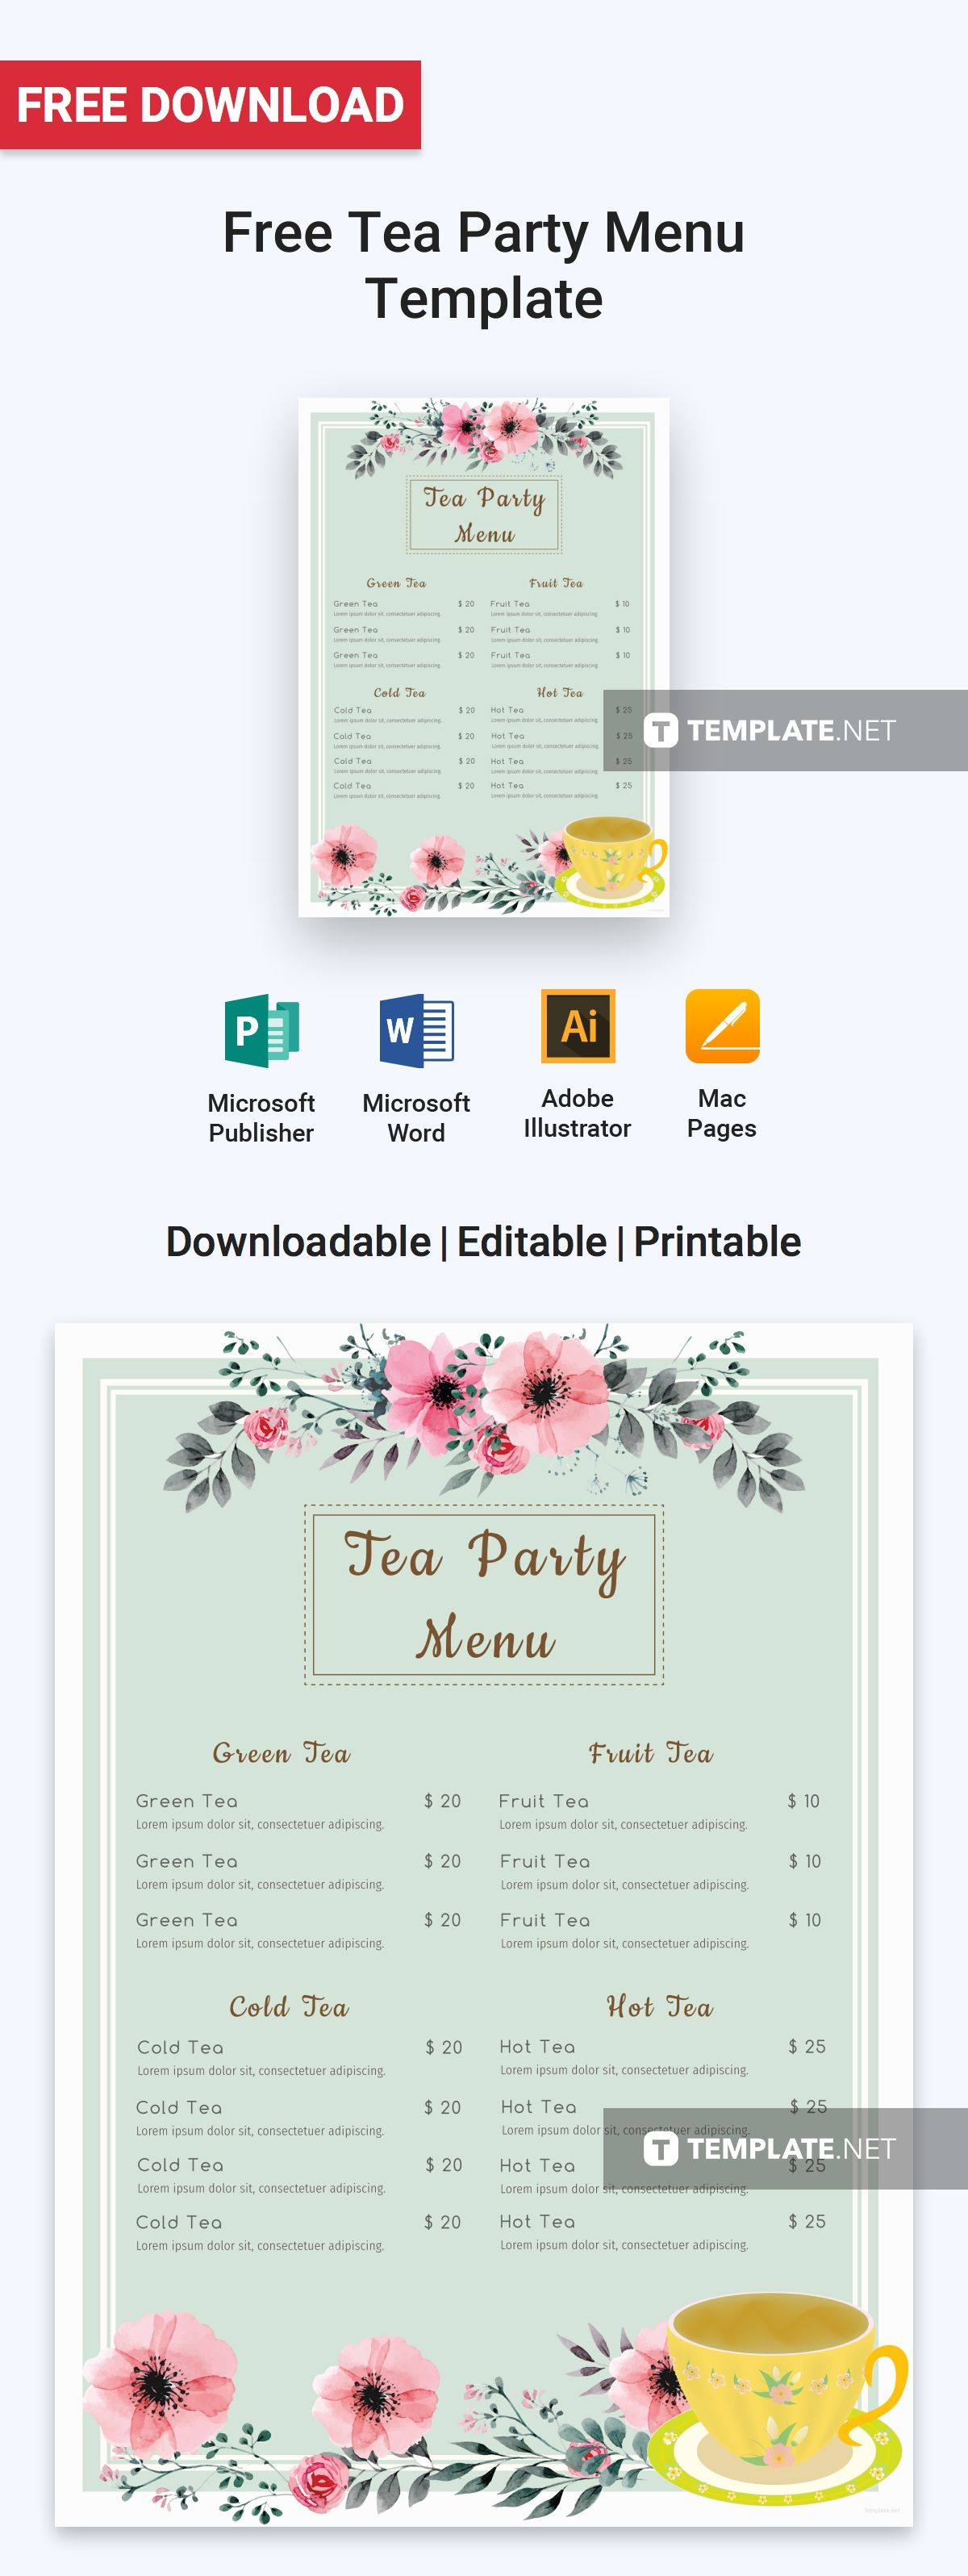 Free Tea Party Menu With Images Tea Party Menu Menu Template